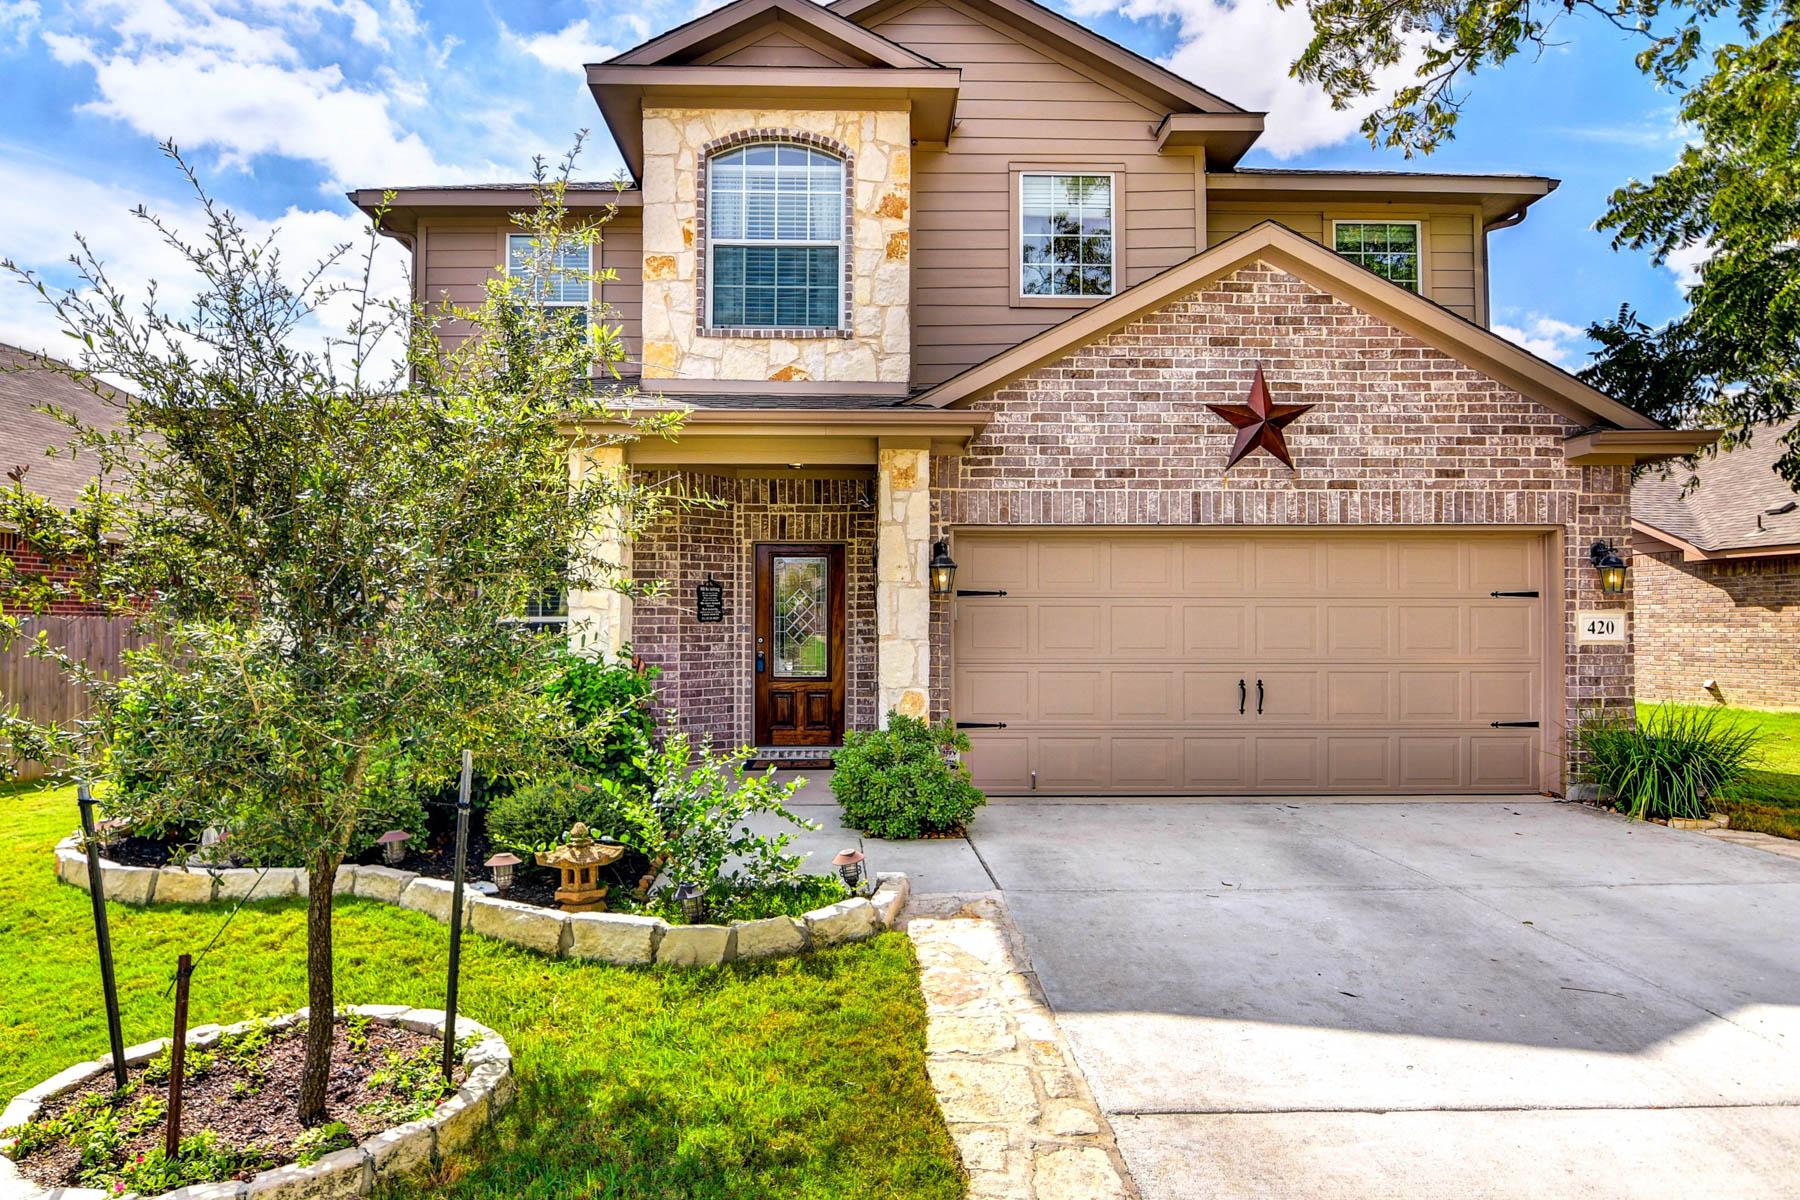 Casa Unifamiliar por un Venta en Gorgeous Home in Buffalo Crossing 420 Bison Ln Cibolo, Texas 78108 Estados Unidos